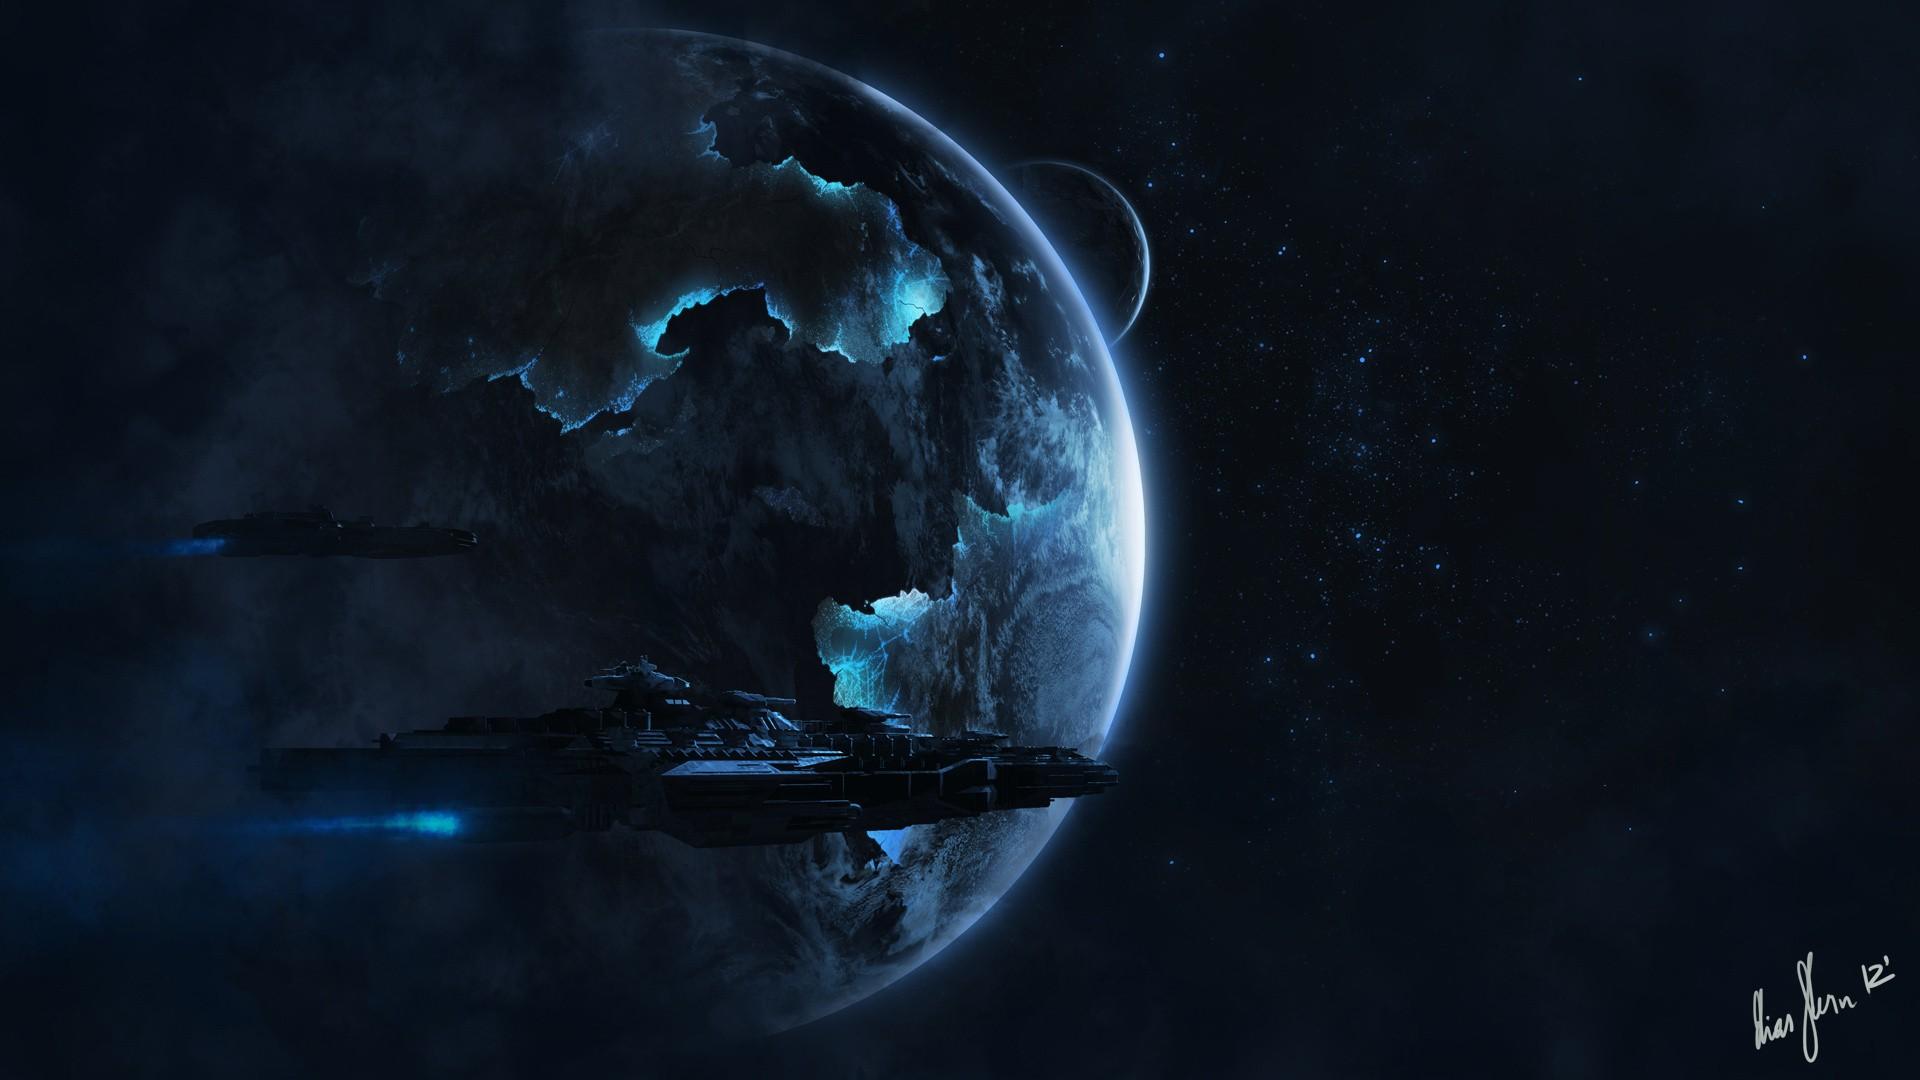 Alien spaceship HD Wallpaper | Background Image ...